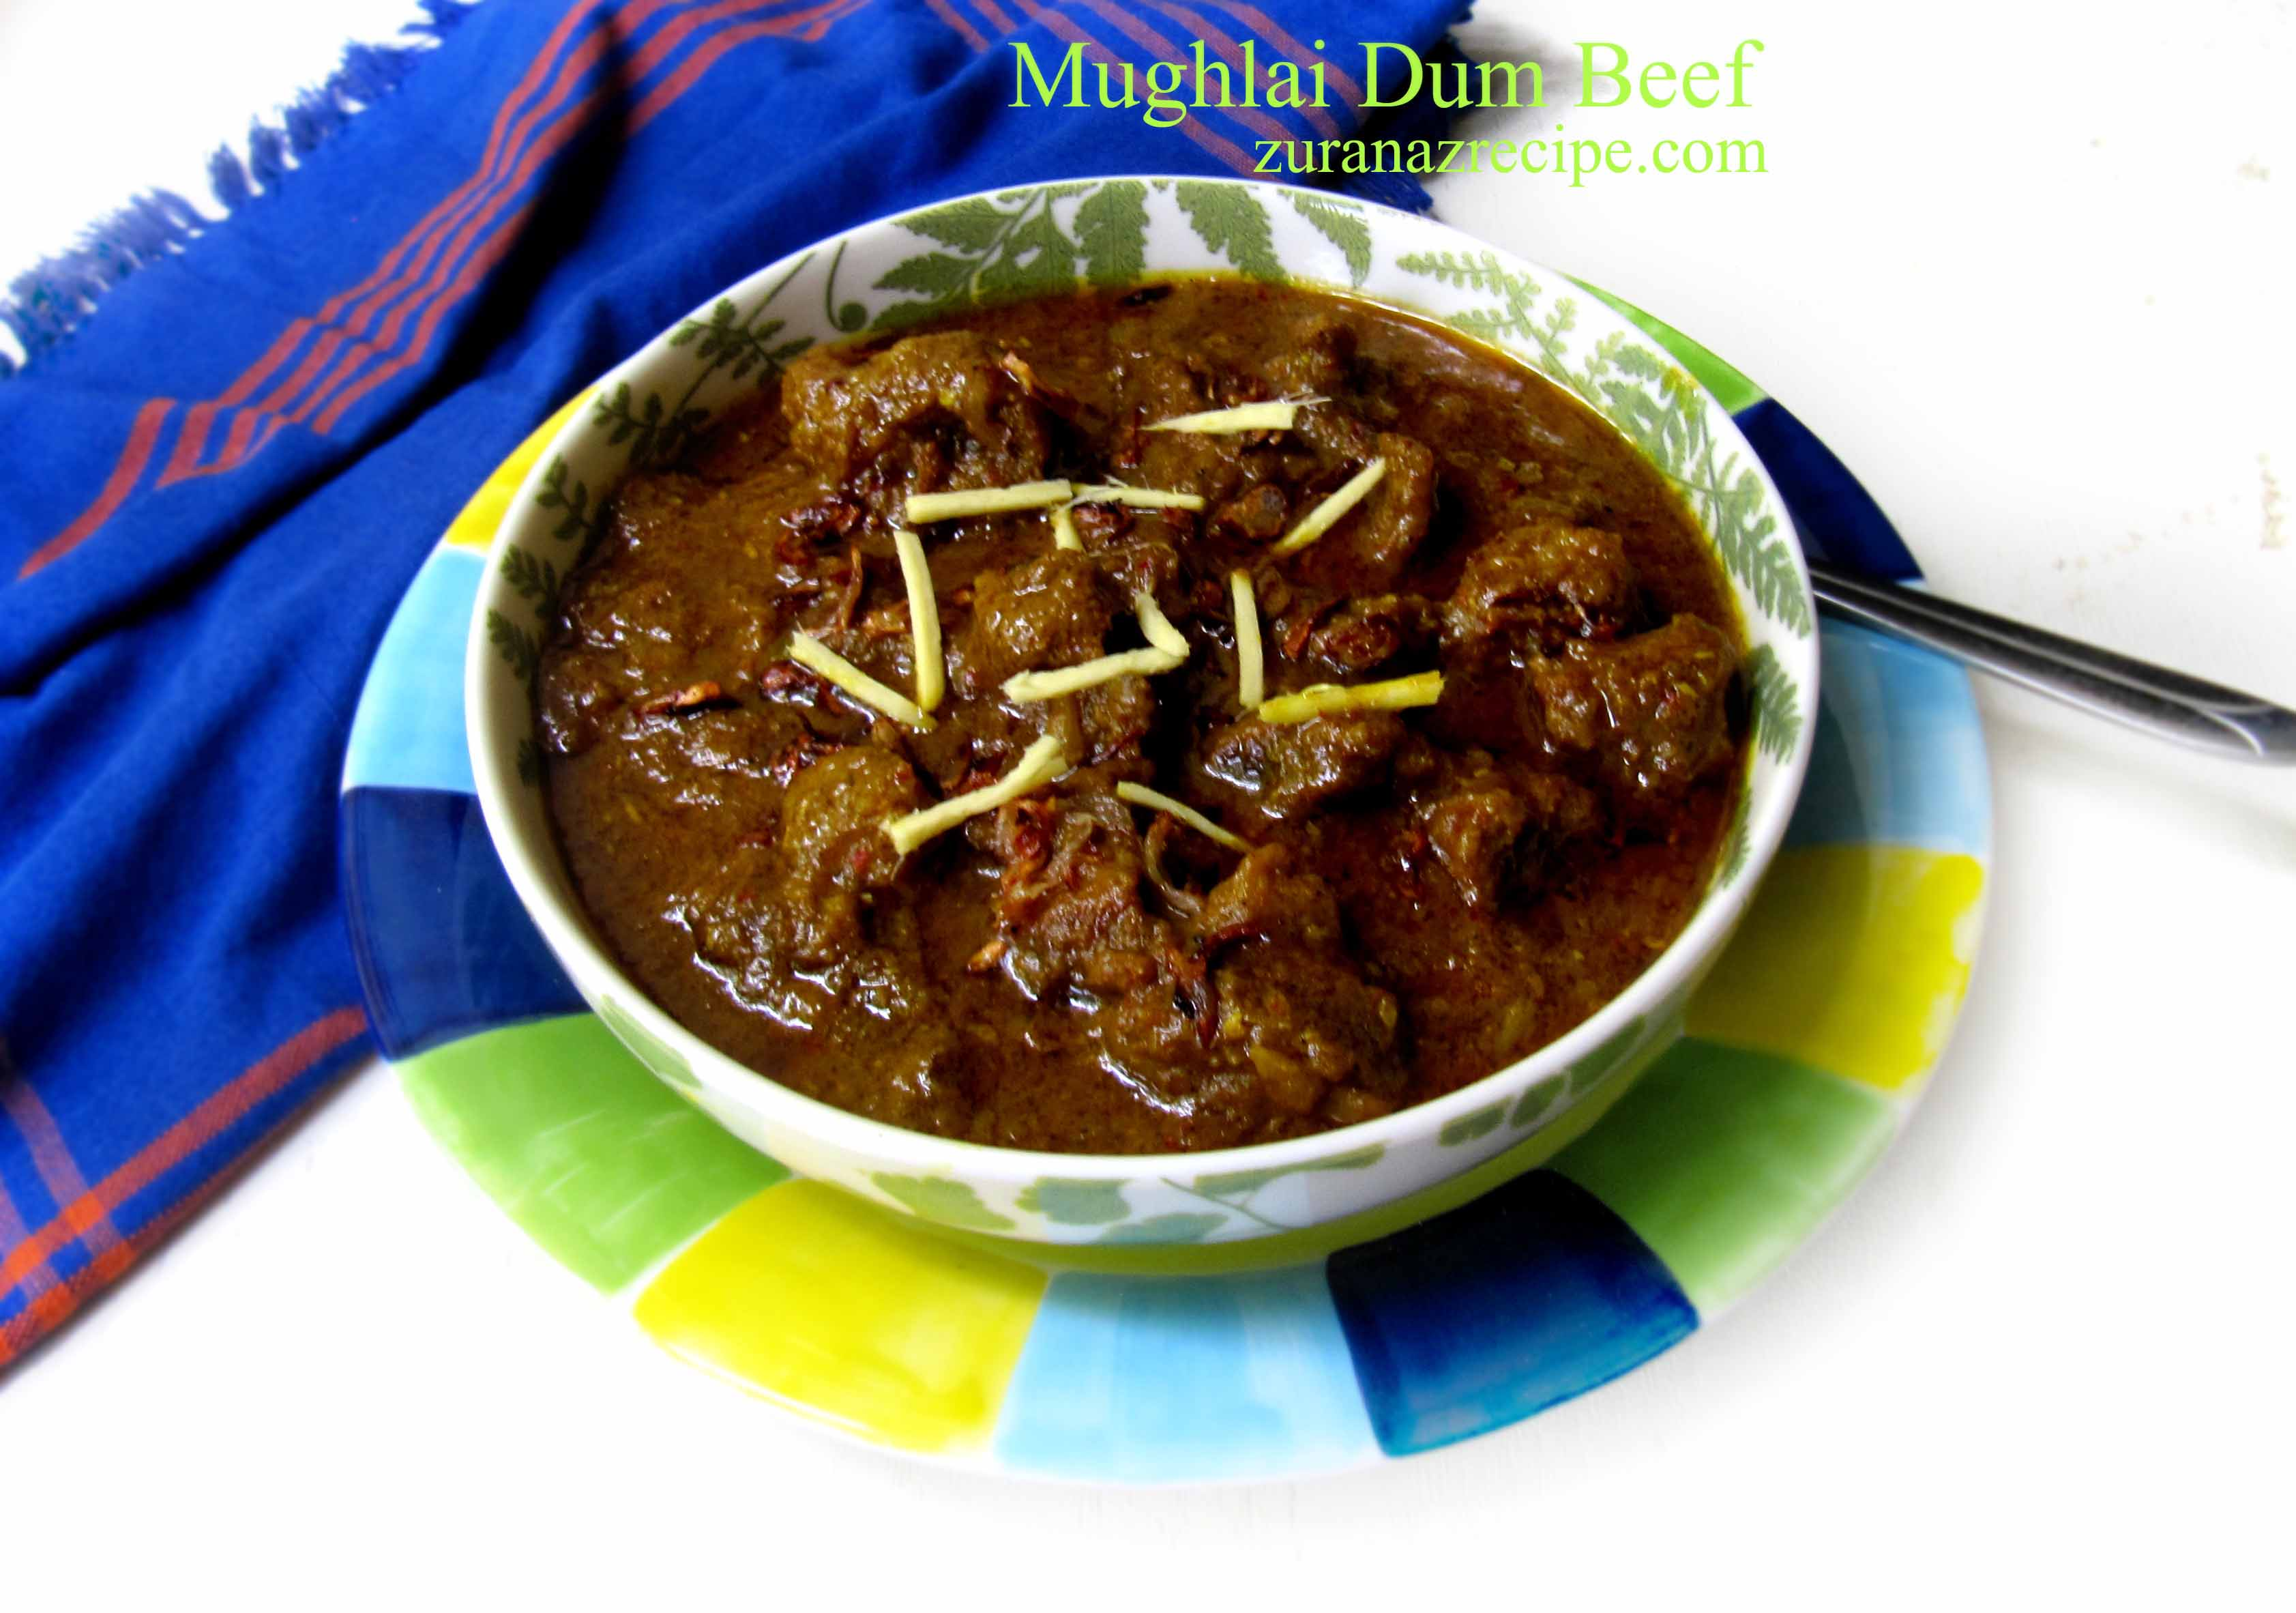 Mughlai Dum Beef